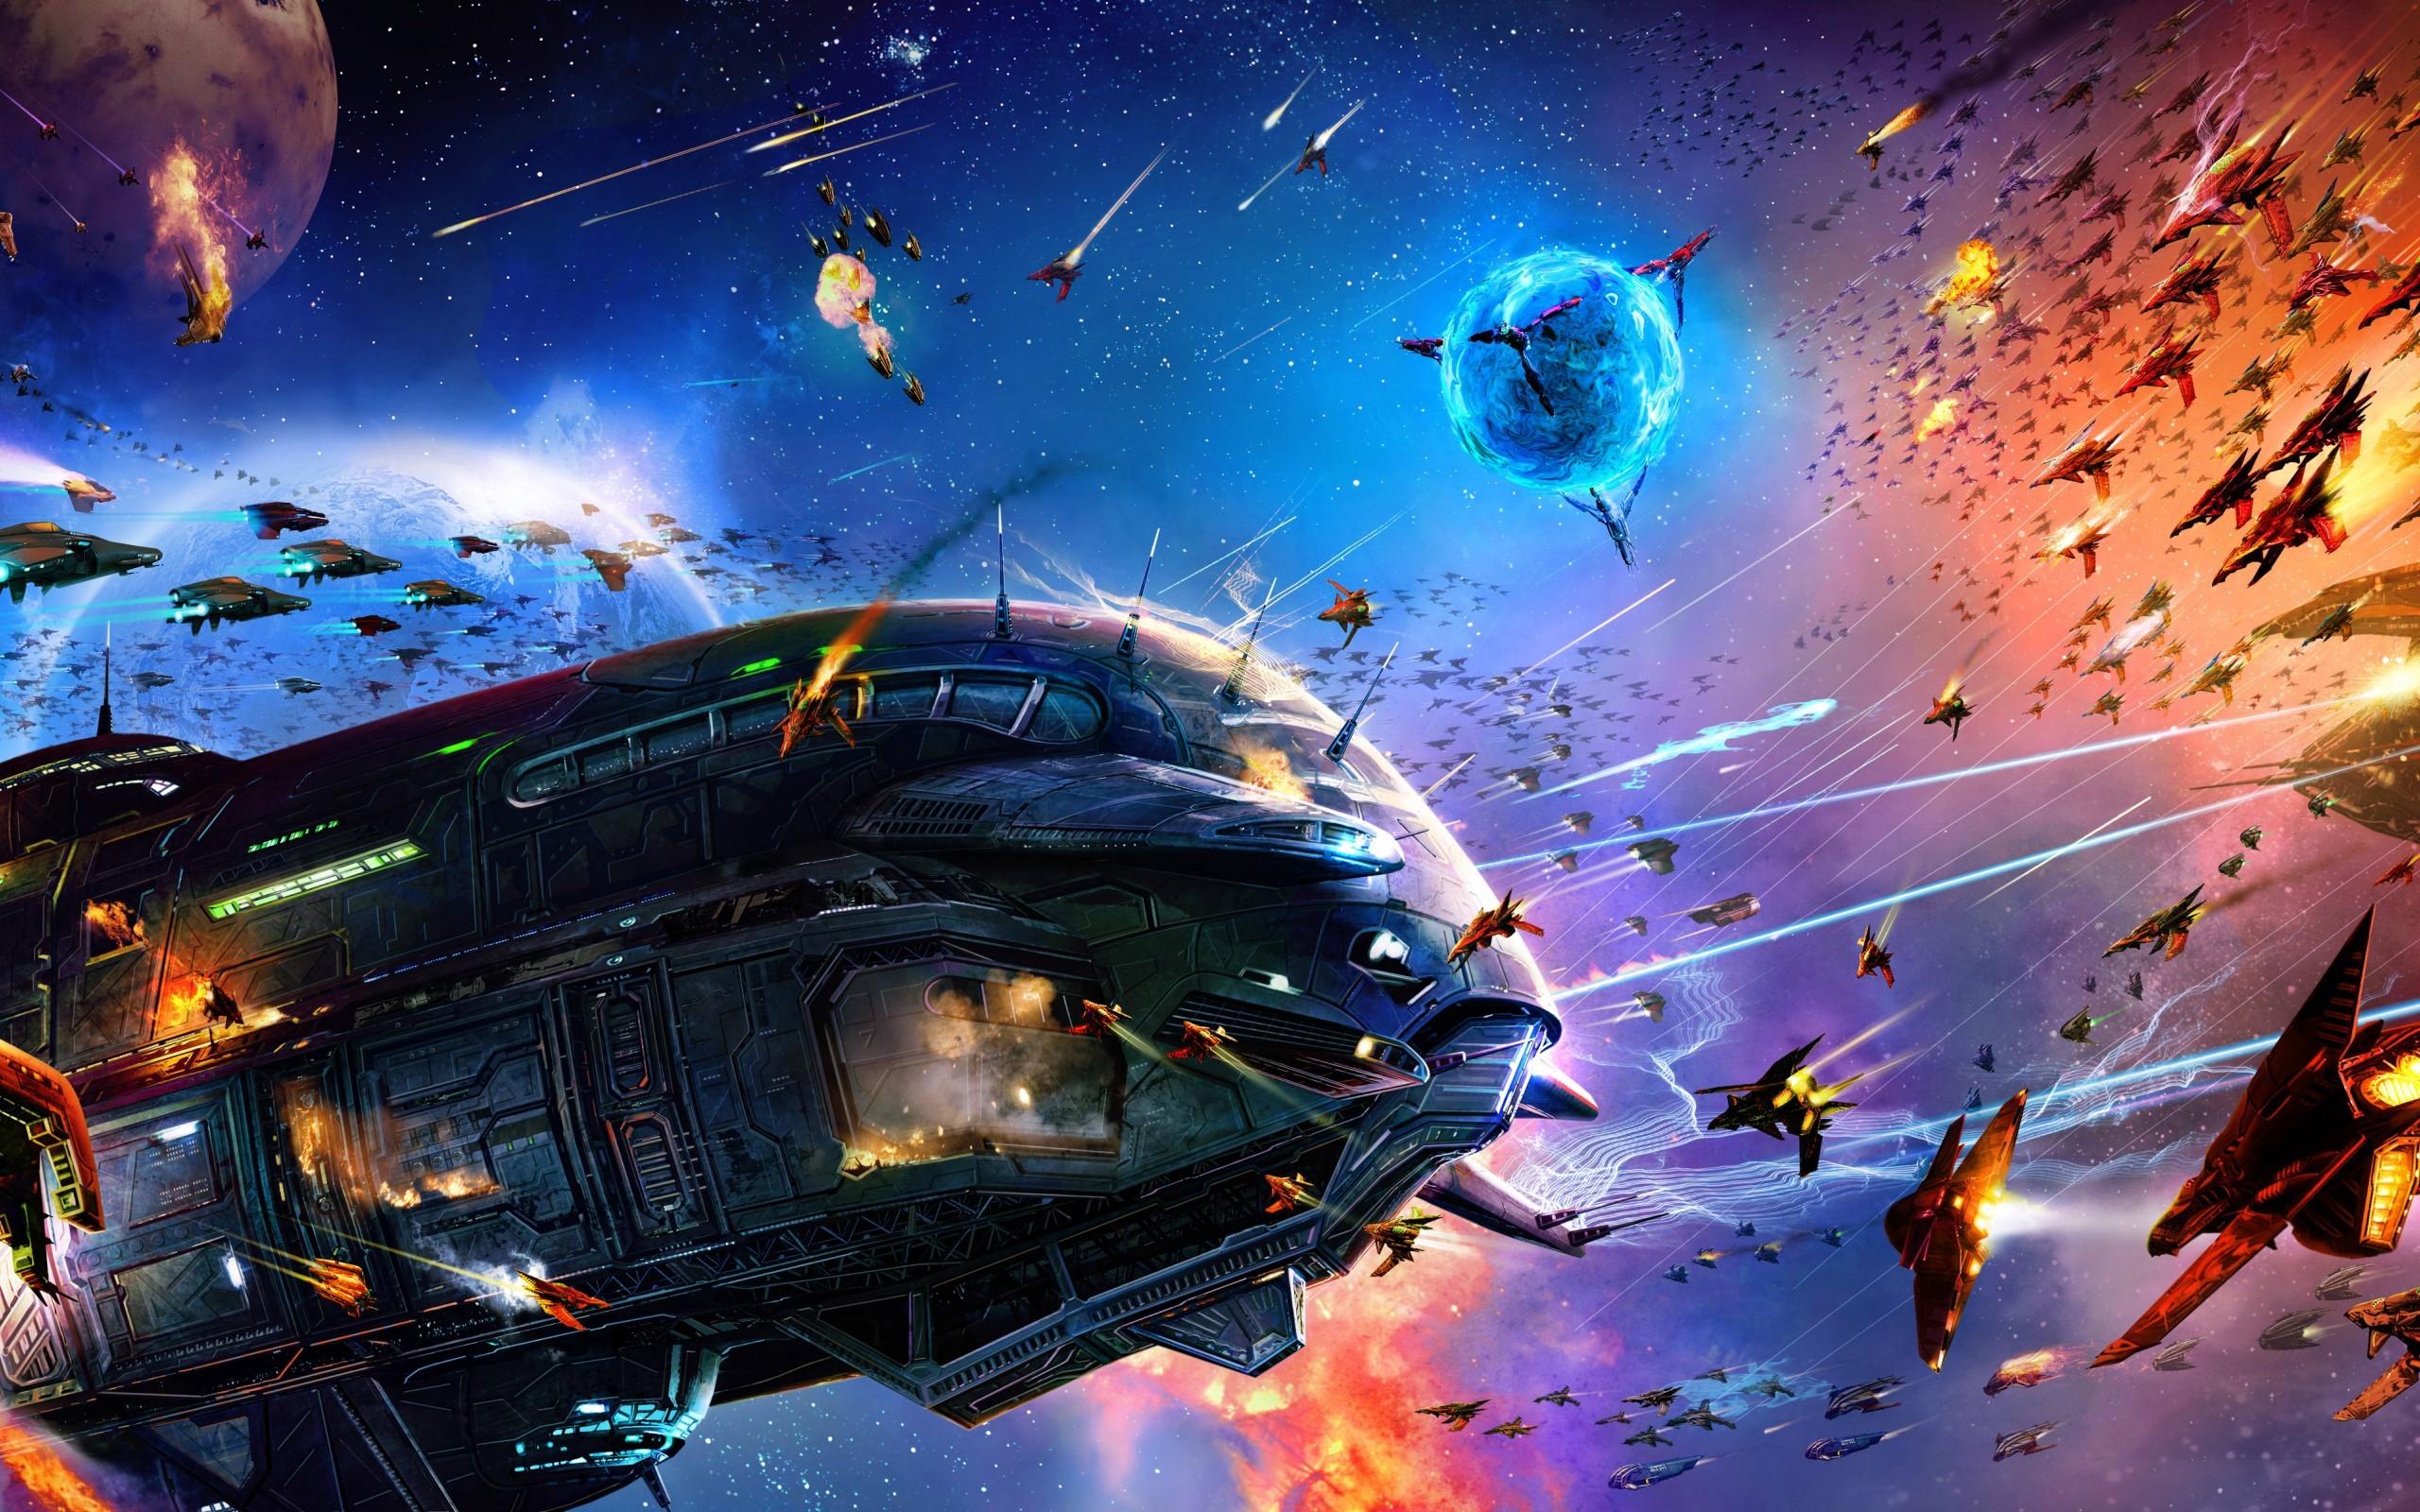 Video Game – Jumpgate Evolution Spaceship Battle Wallpaper